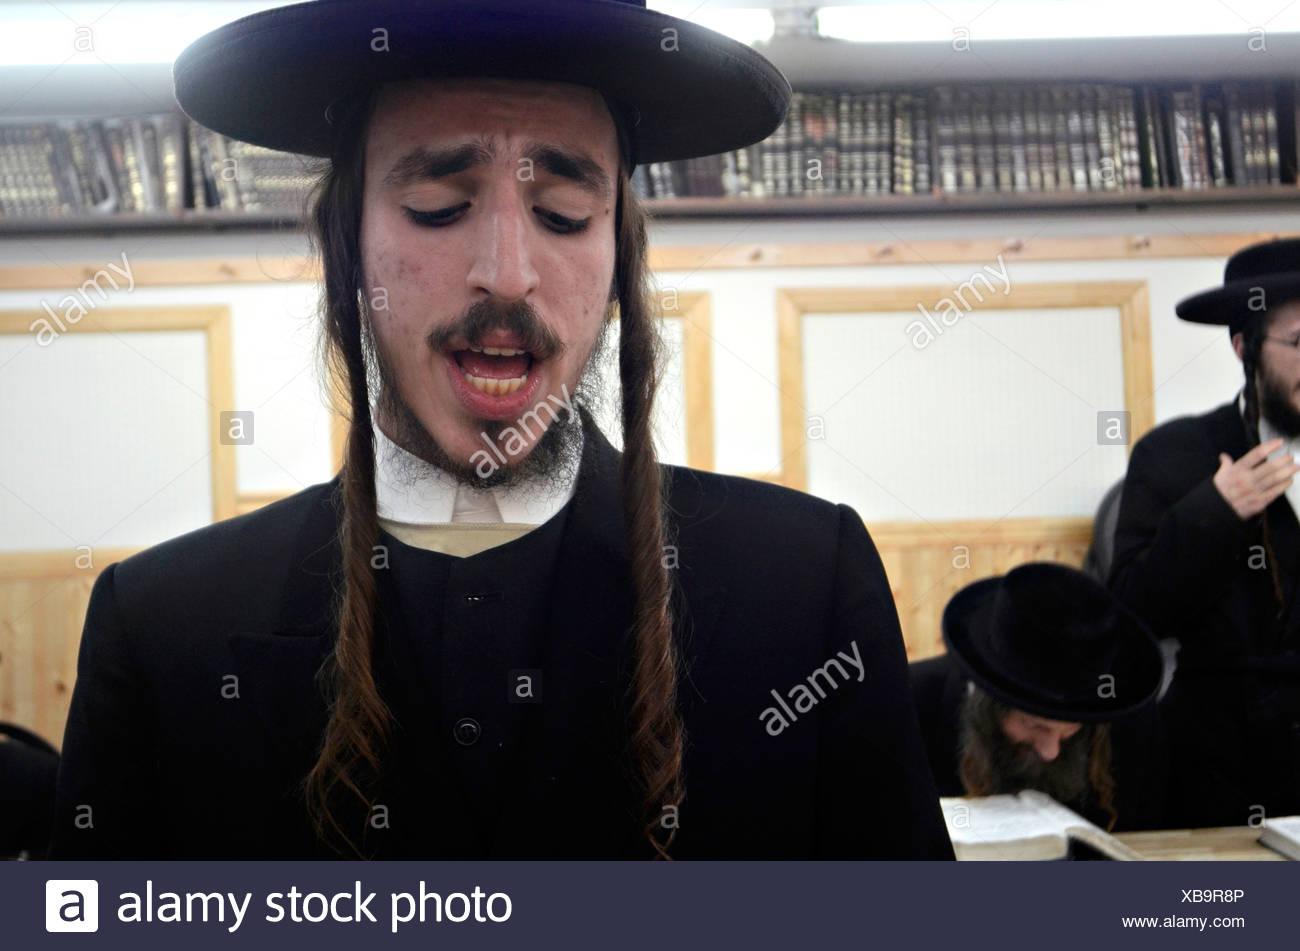 Extremist Haredi Jewish men praying, Lev Tahor (Pure Heart) community, Sainte Agathe des Monts, Quebec, Canada - Stock Image